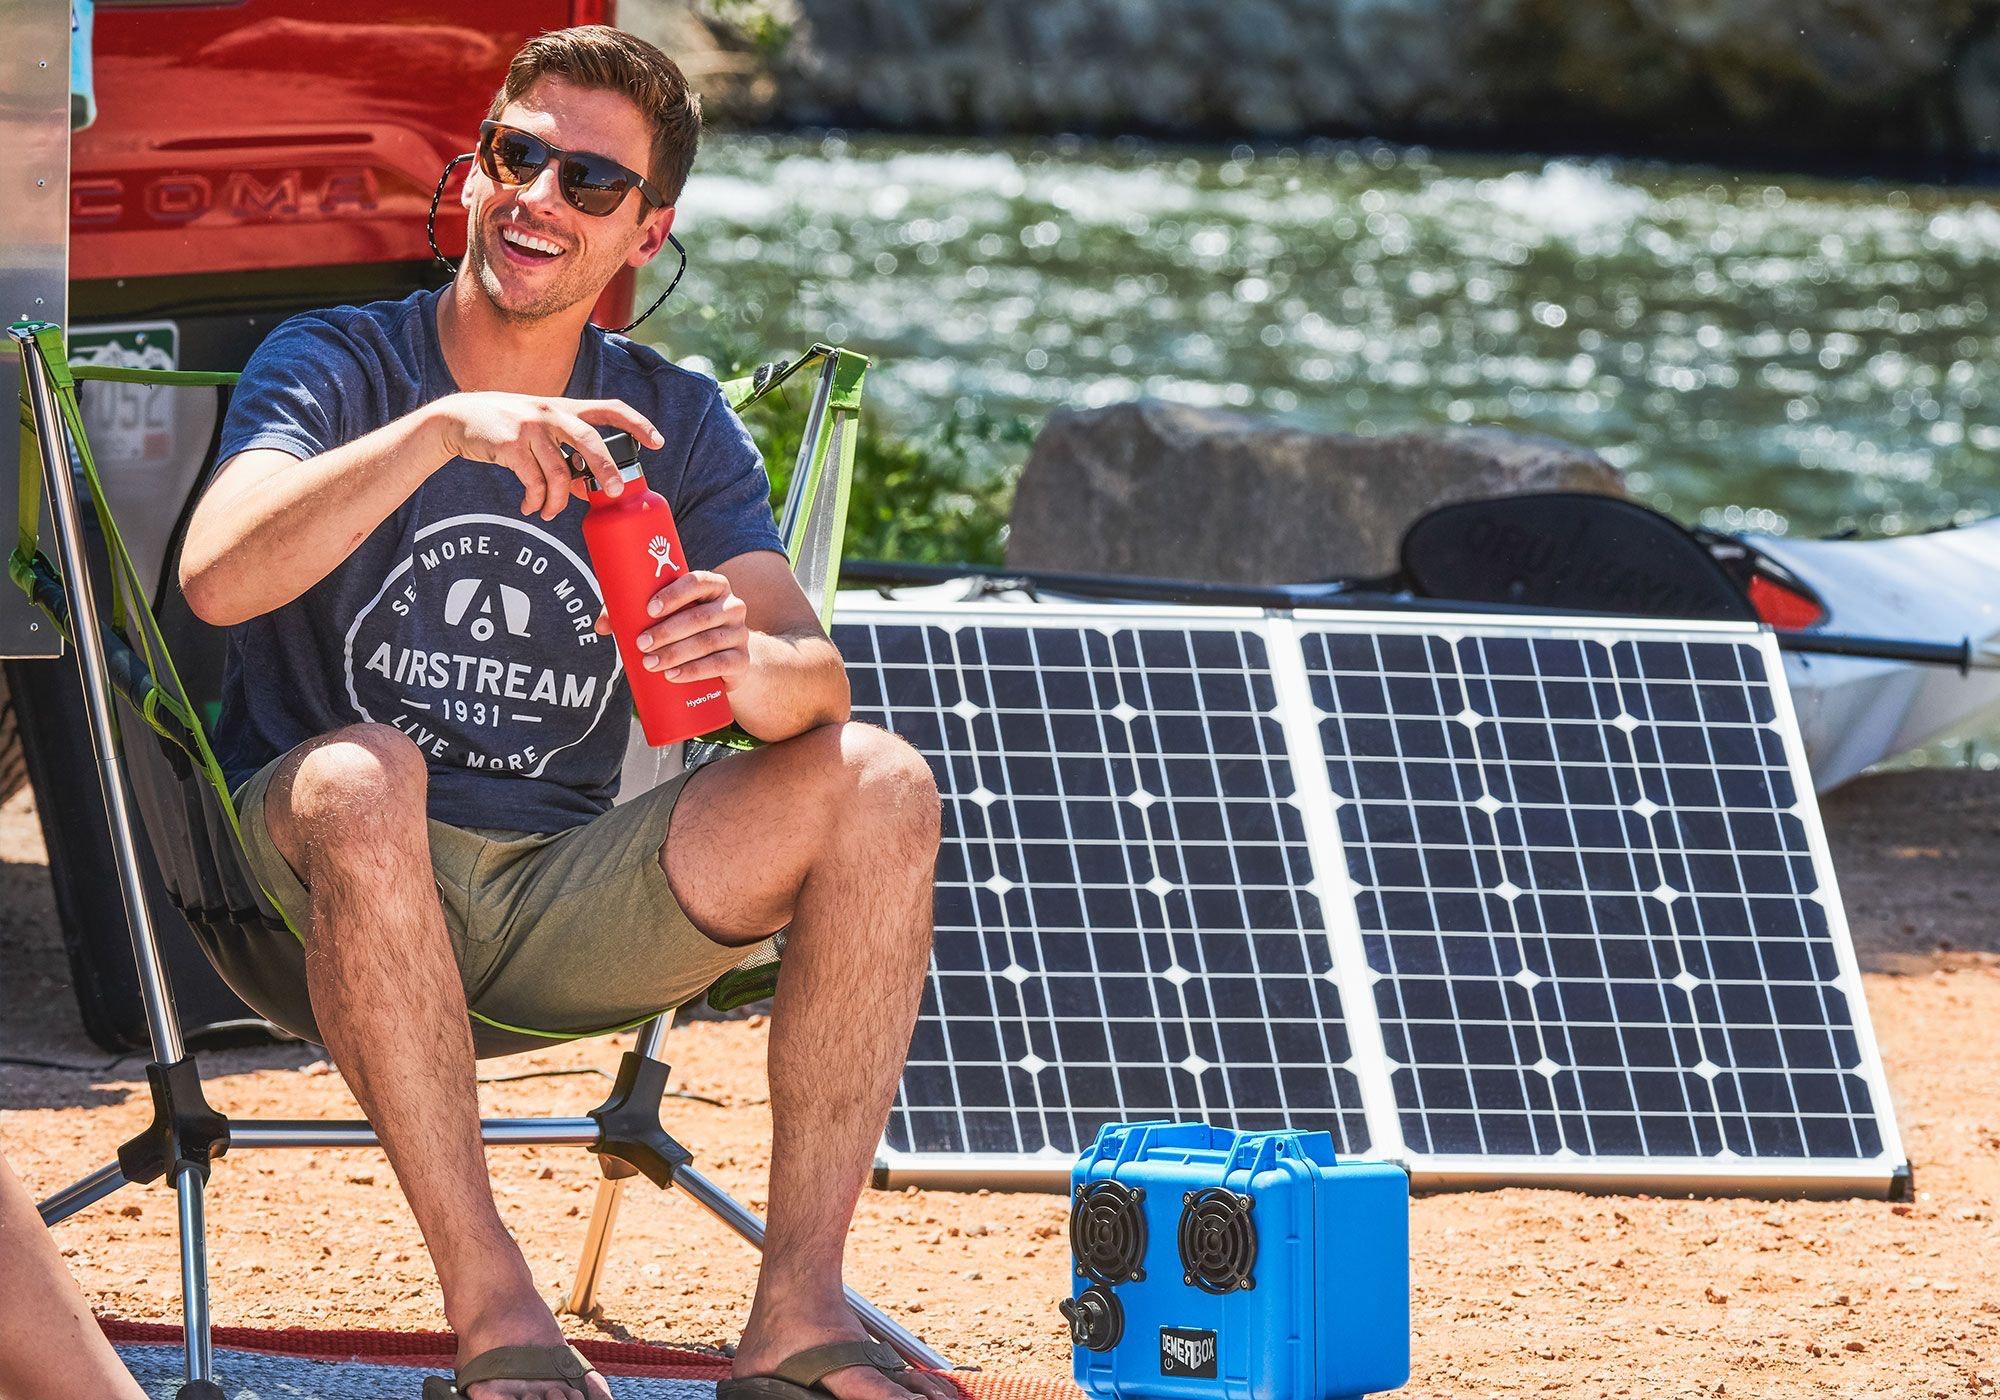 Airstream and Zamp Solar Panels